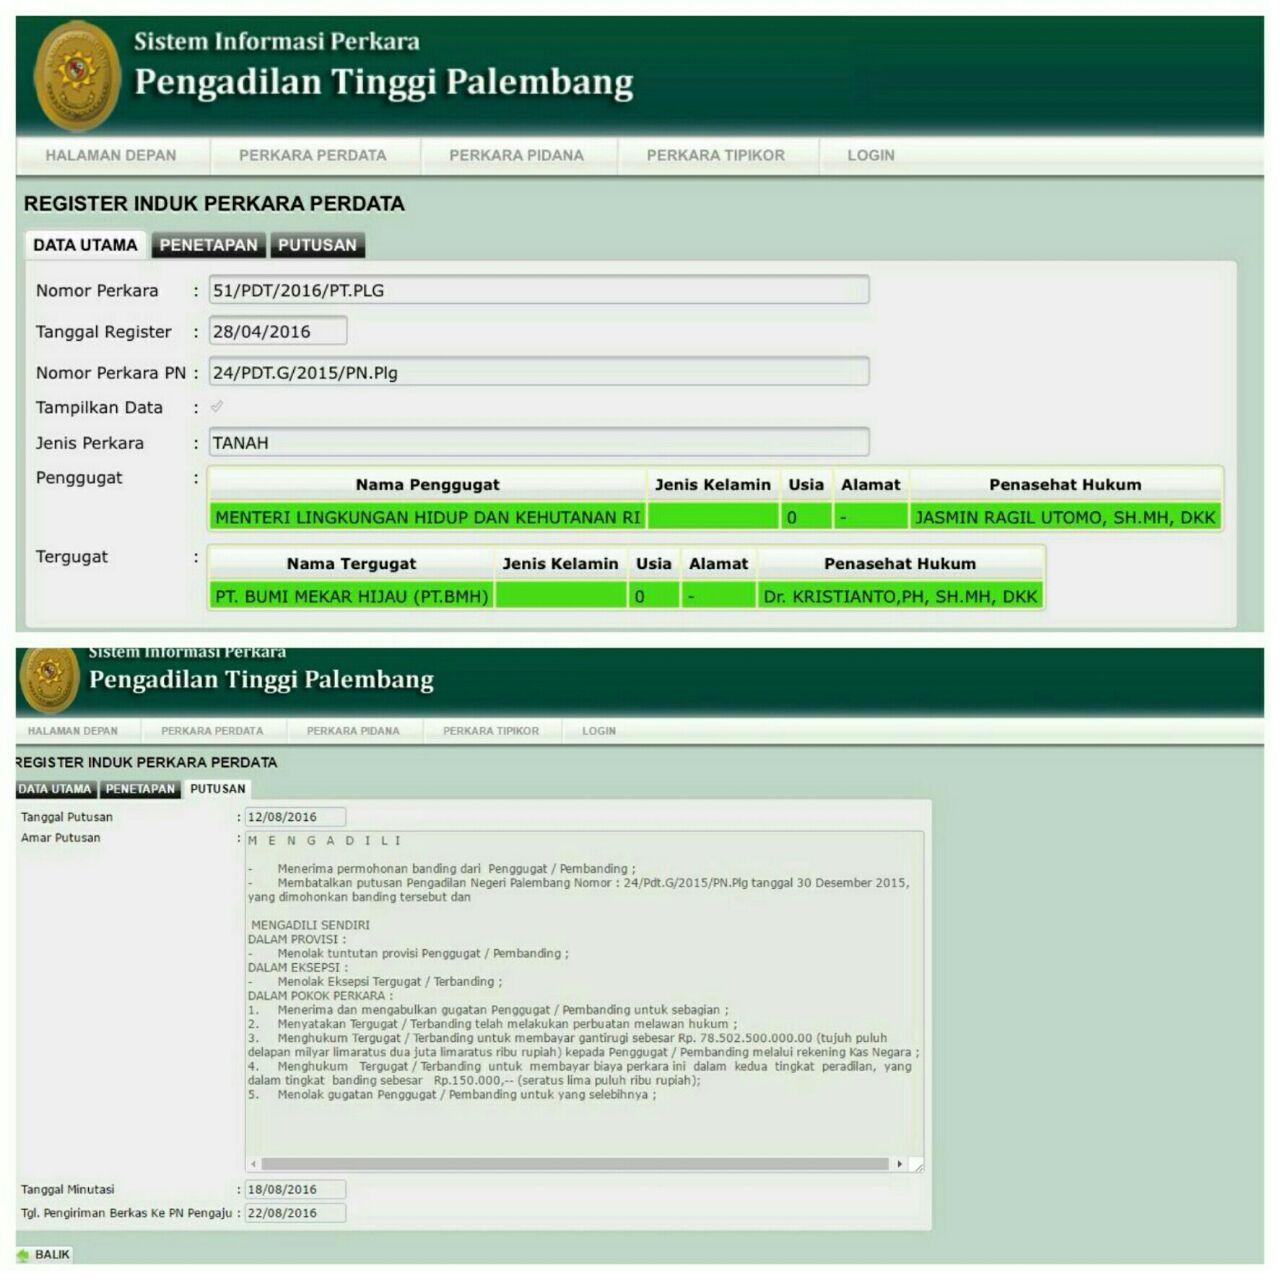 Pengadilan Tinggi Nyatakan PT. BMH bersalah dan Di Hukum Ganti Rugi